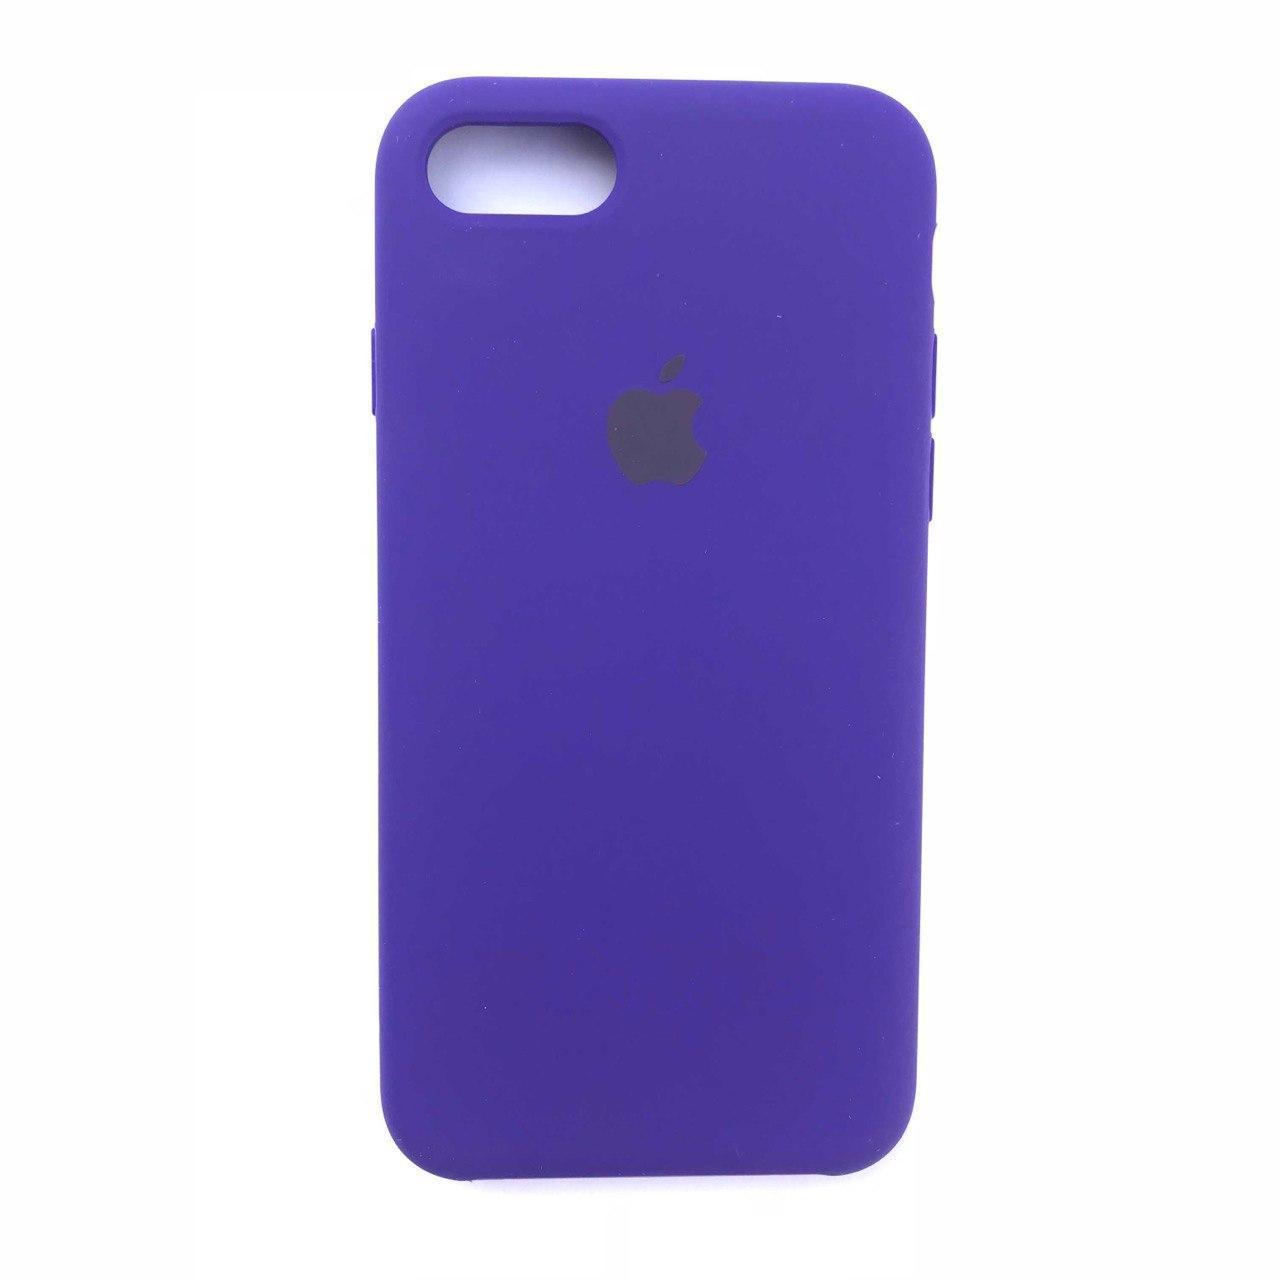 Накладка Silicone Case ARM для Apple iPhone 7 iPhone 8 Ultra Violet